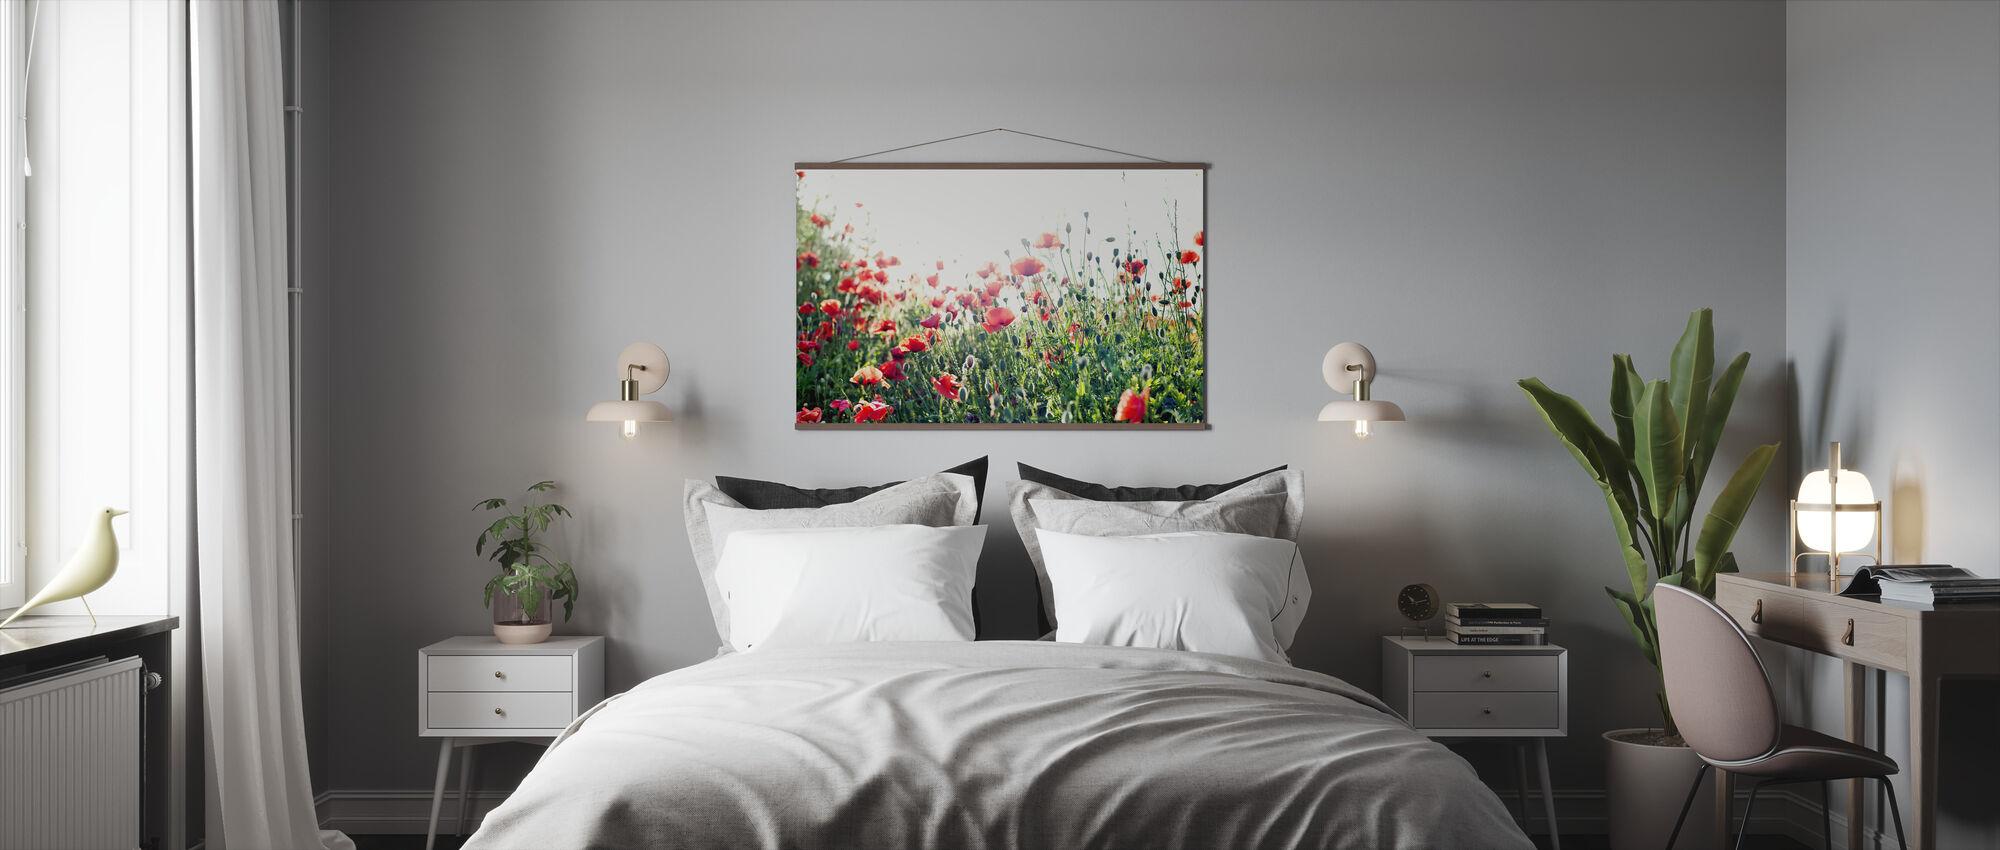 Gotland Poppies - Poster - Bedroom